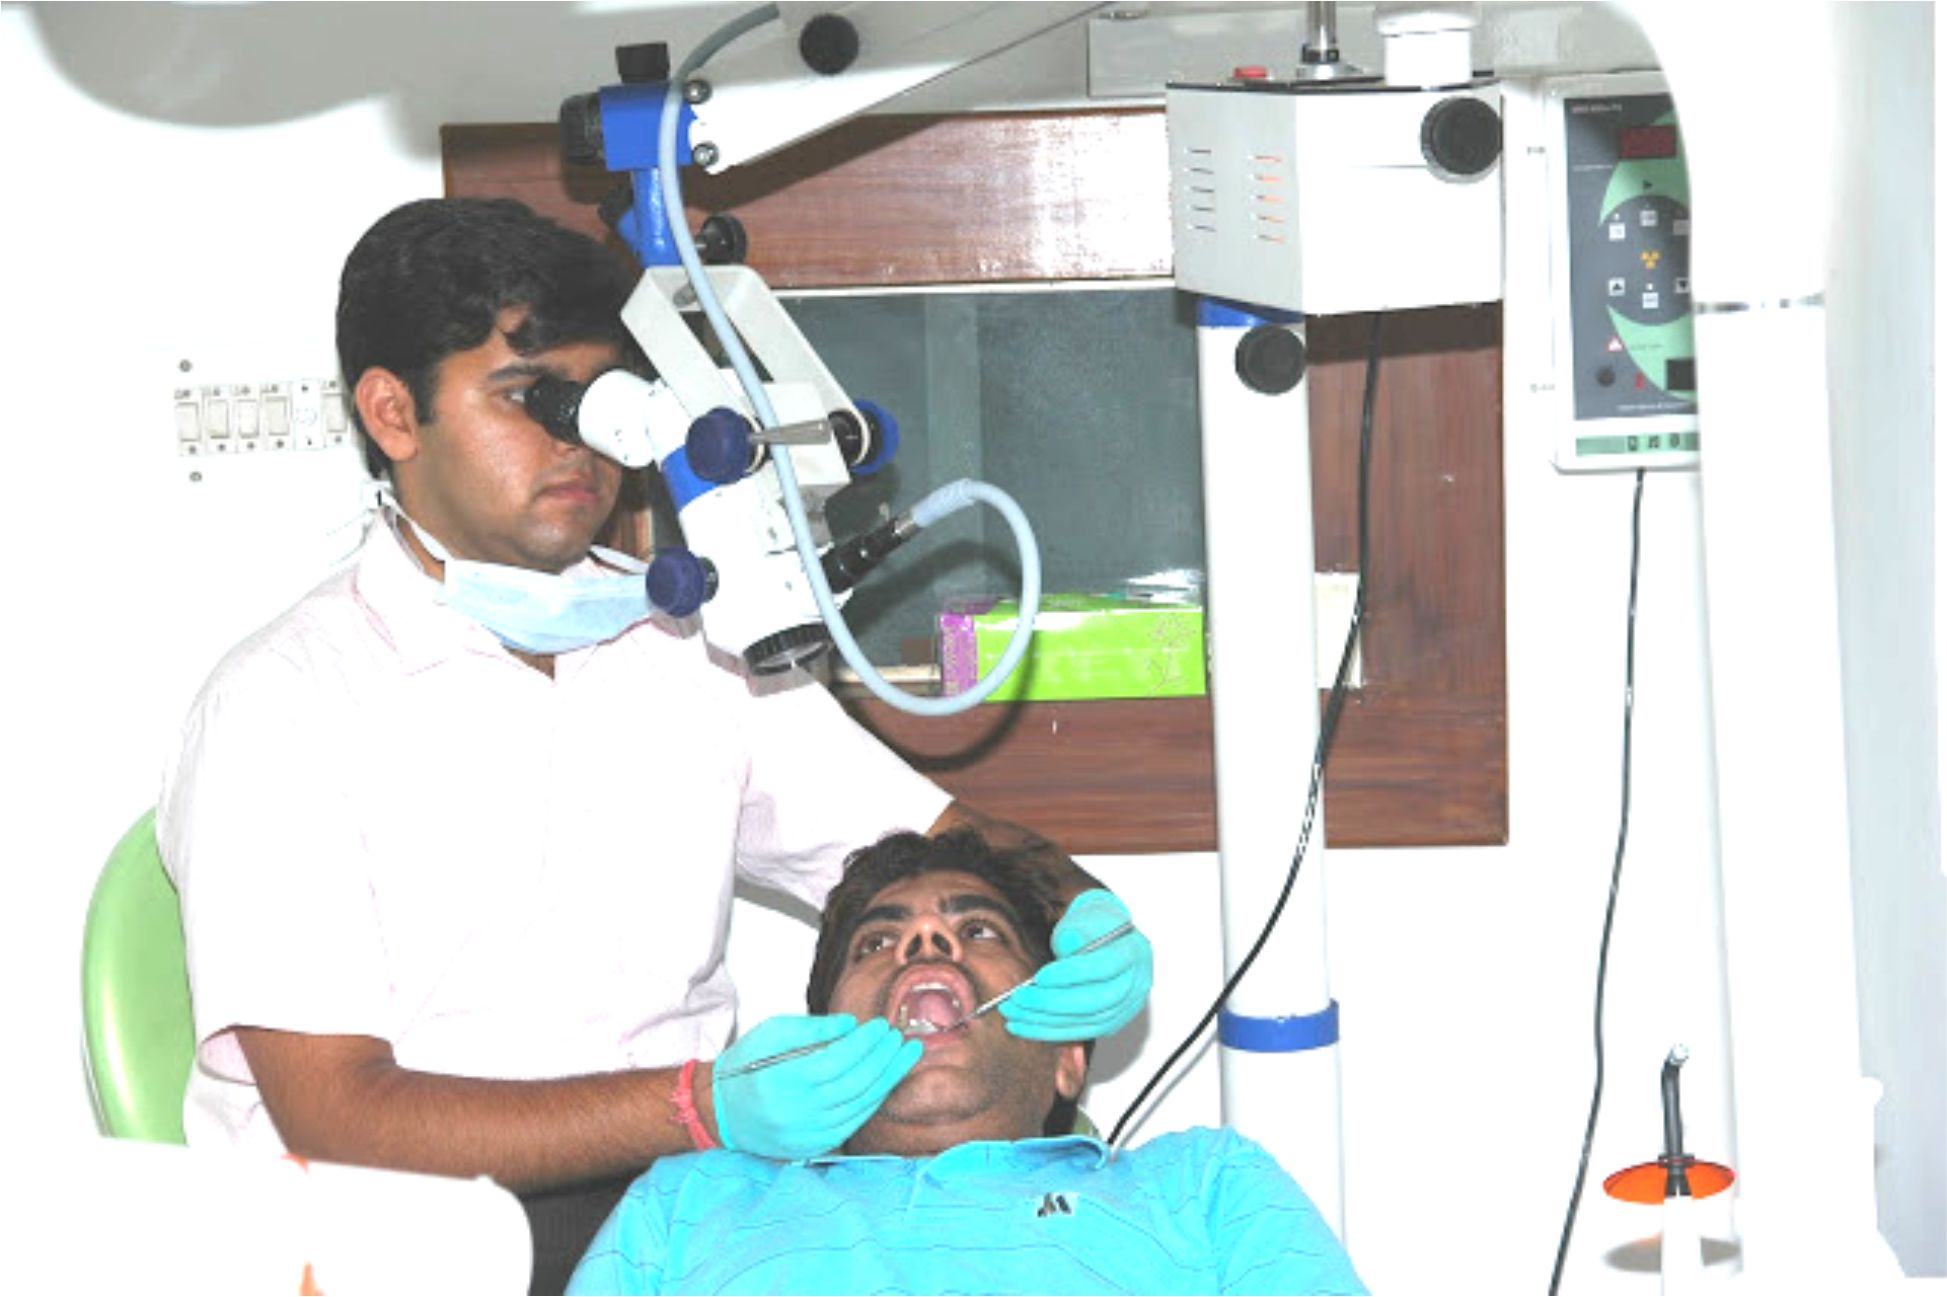 Dr. Nikhil Working on Microscope